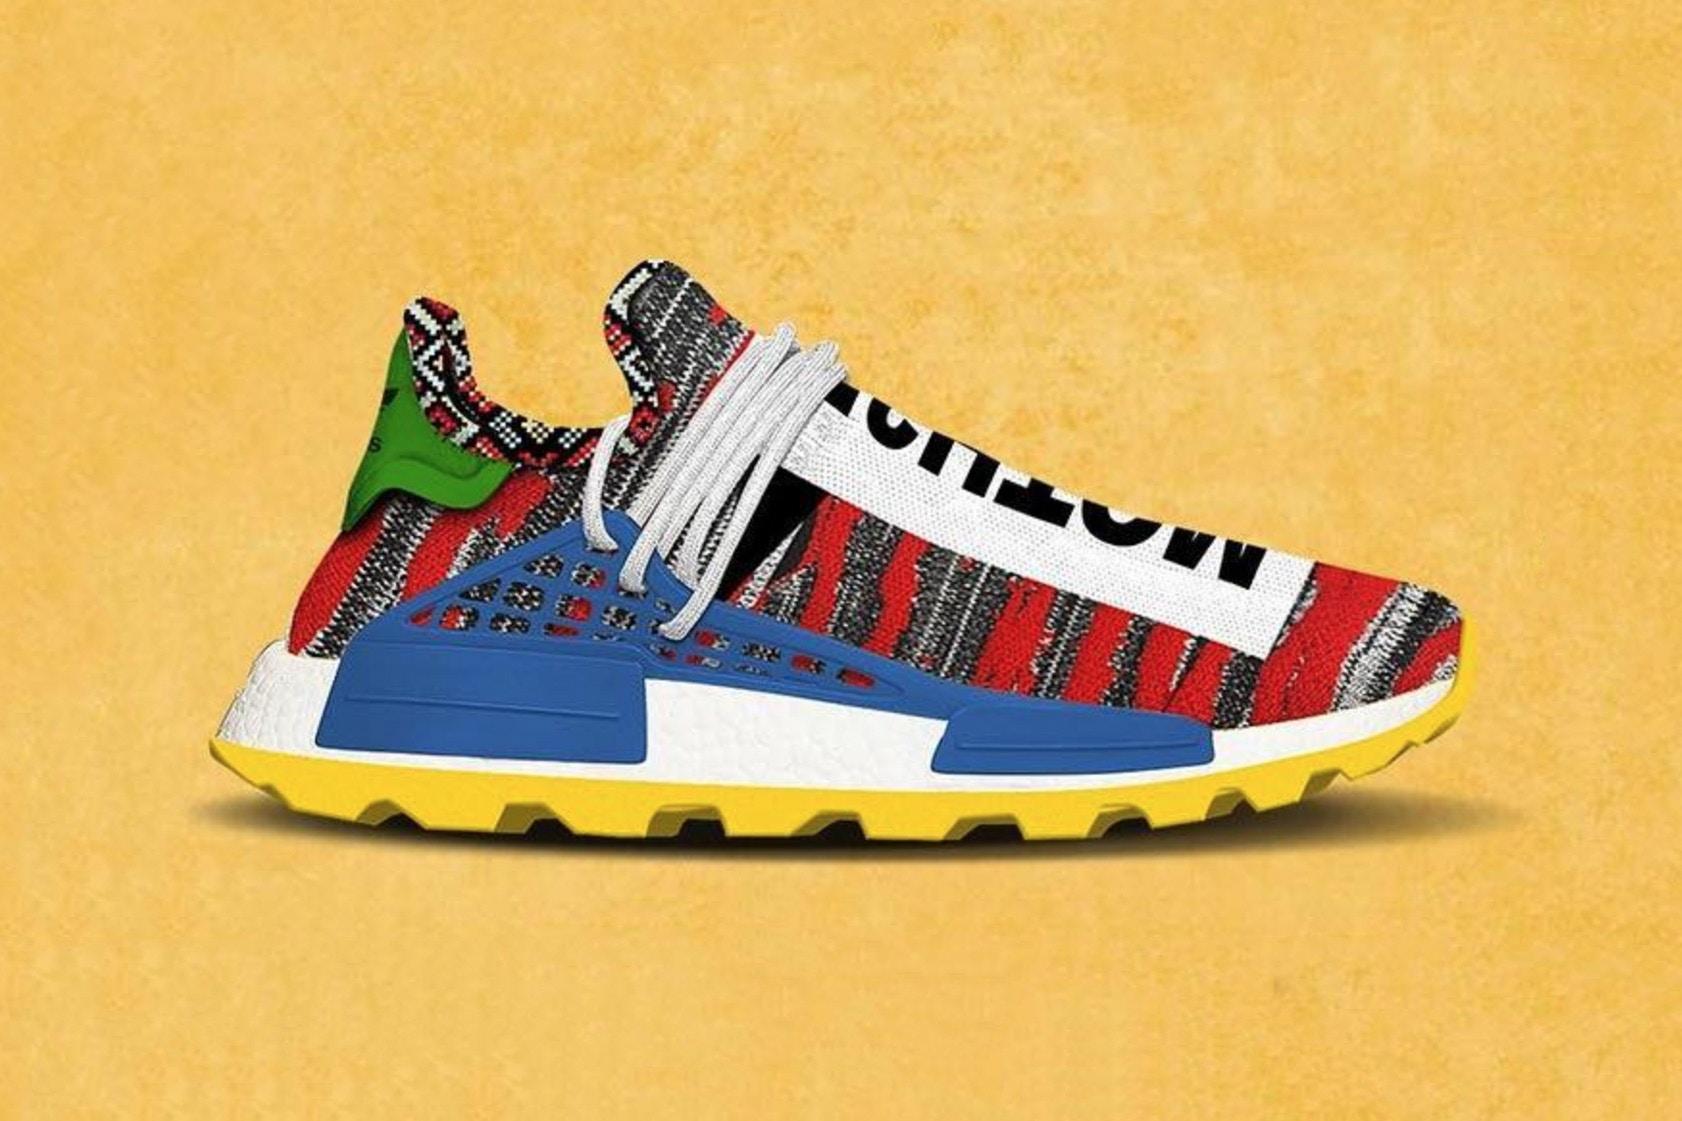 adidas-pharrell-afro-hu-nmd-03